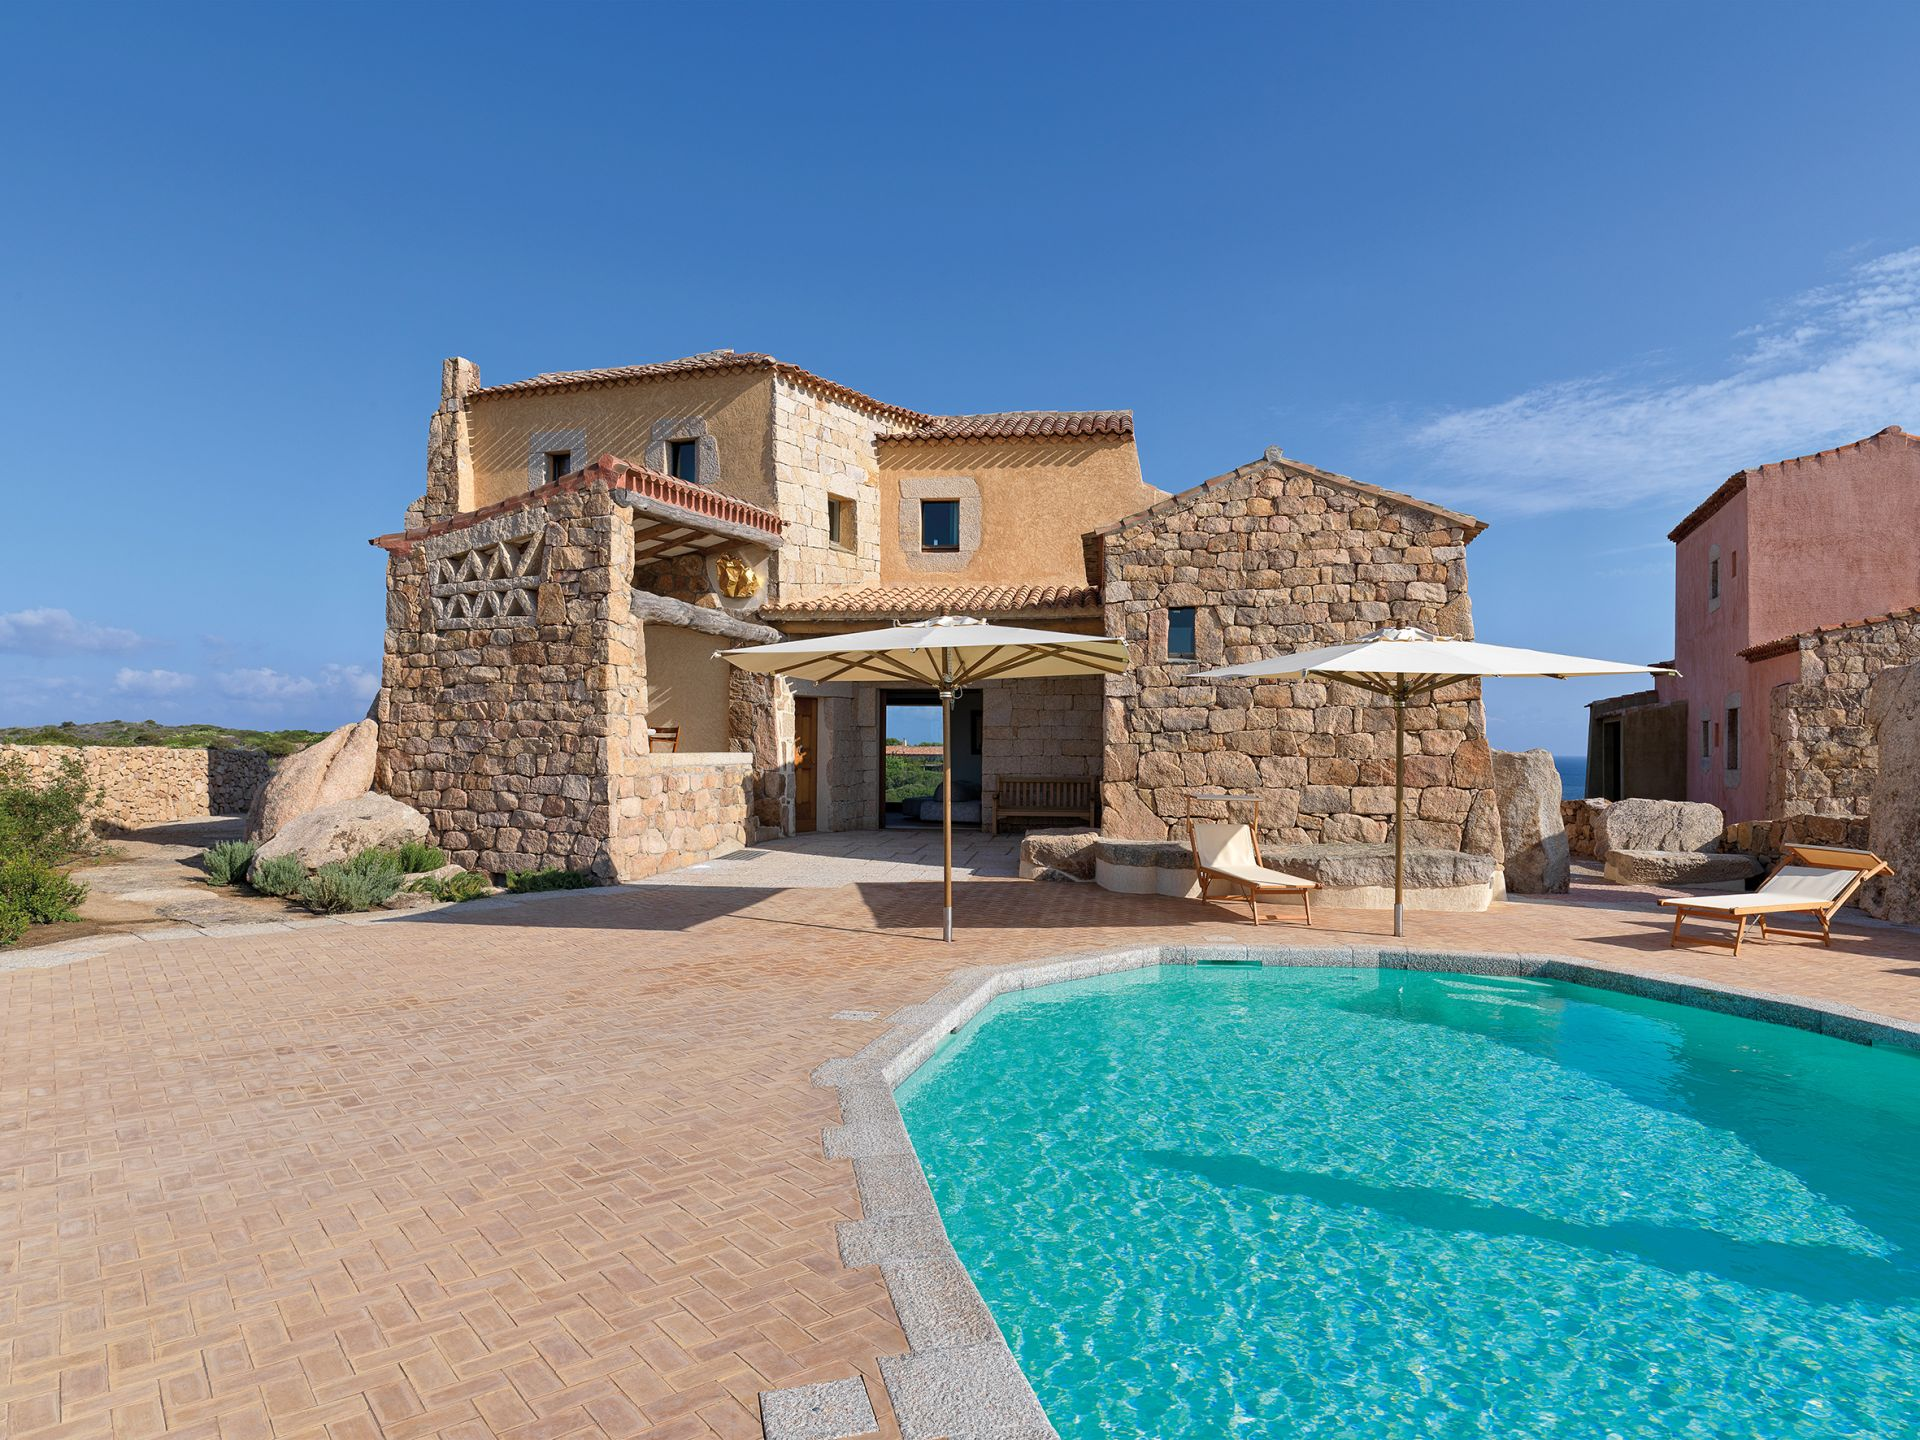 Villa in Sardegna - image 14